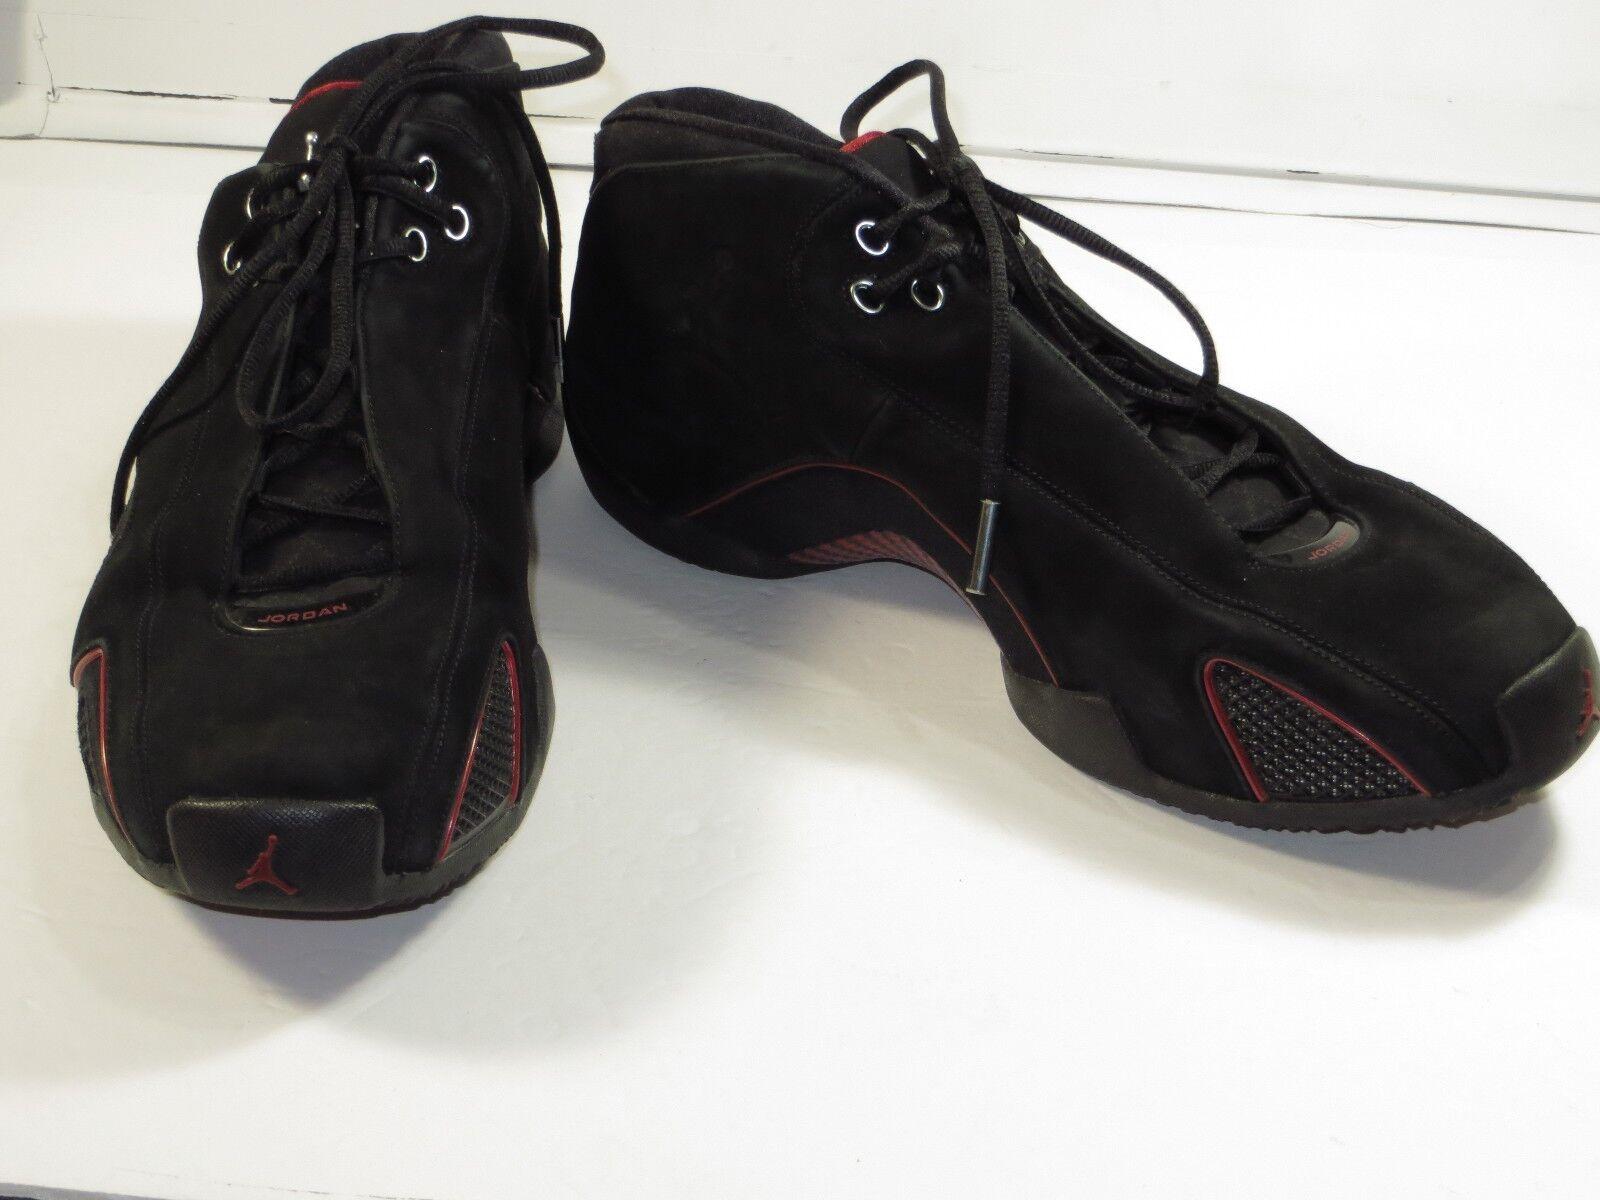 GR8Mens 313529-002 Nike  Air Jordan XXI Low 15 Black/Red  Nike Basketball Shoes155 f79f1b